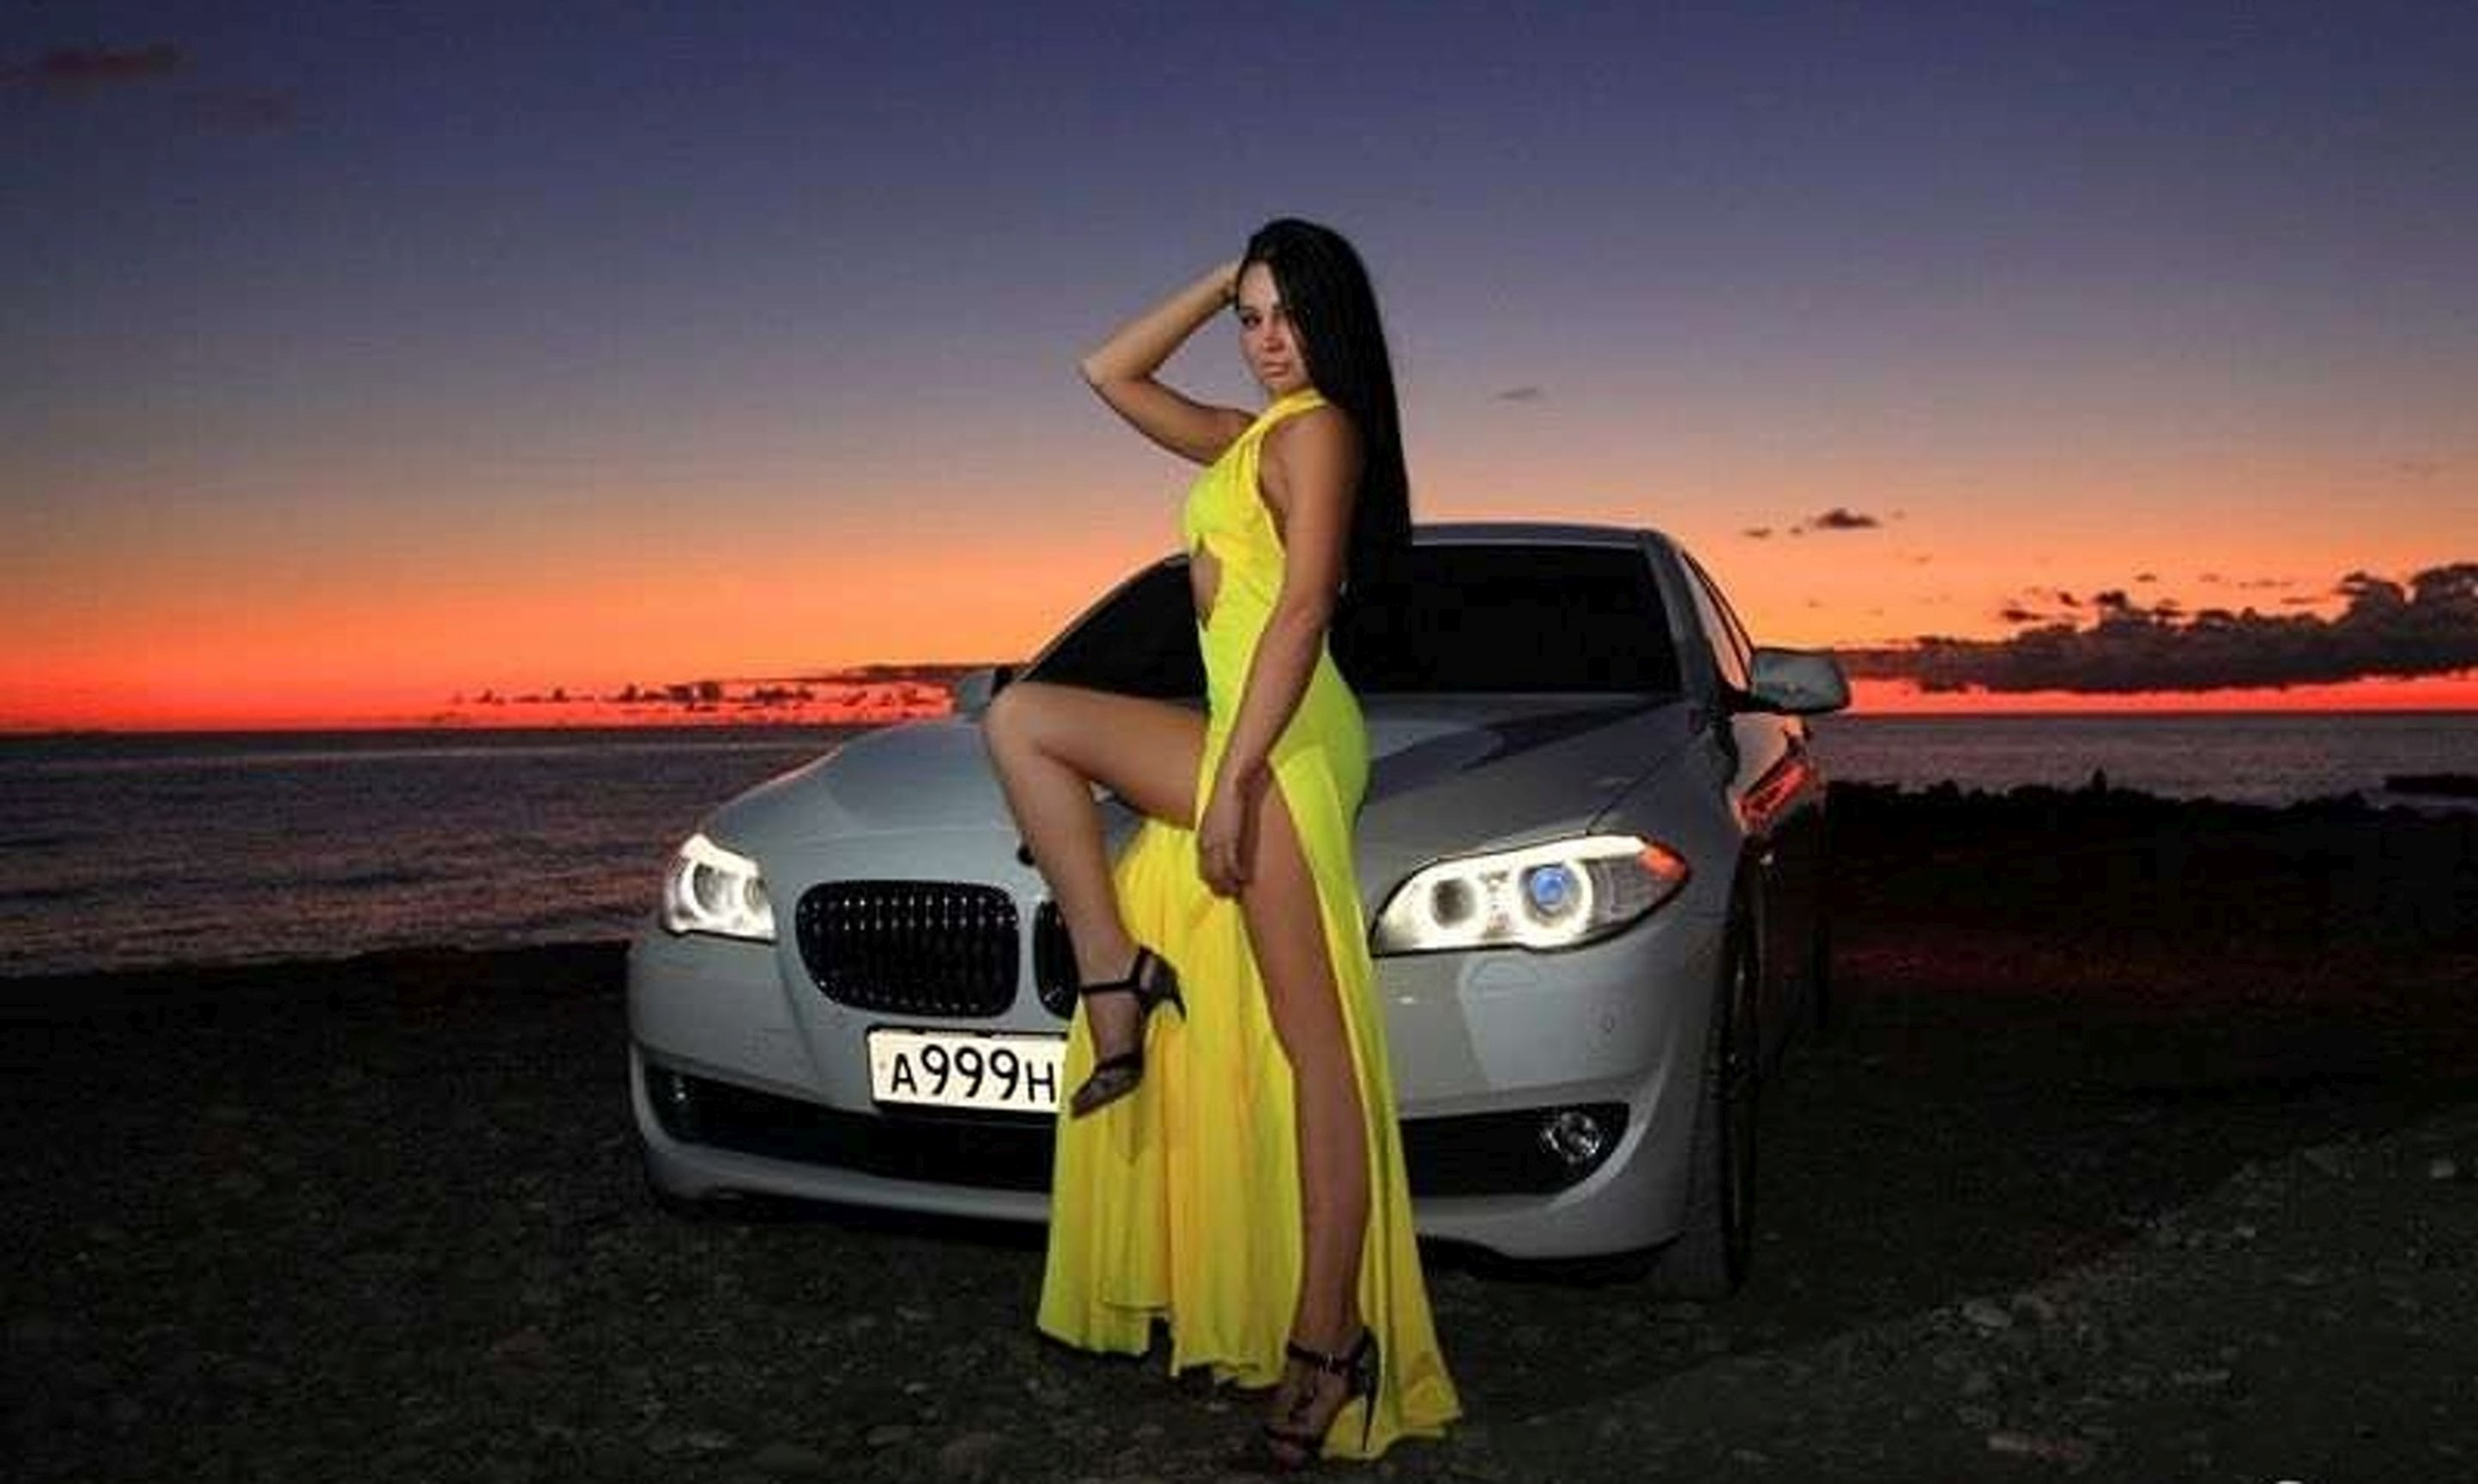 Bmw Girl Wallpaper By Jokensy: Yellow Pretty Sunset Girl BMW Wallpaper